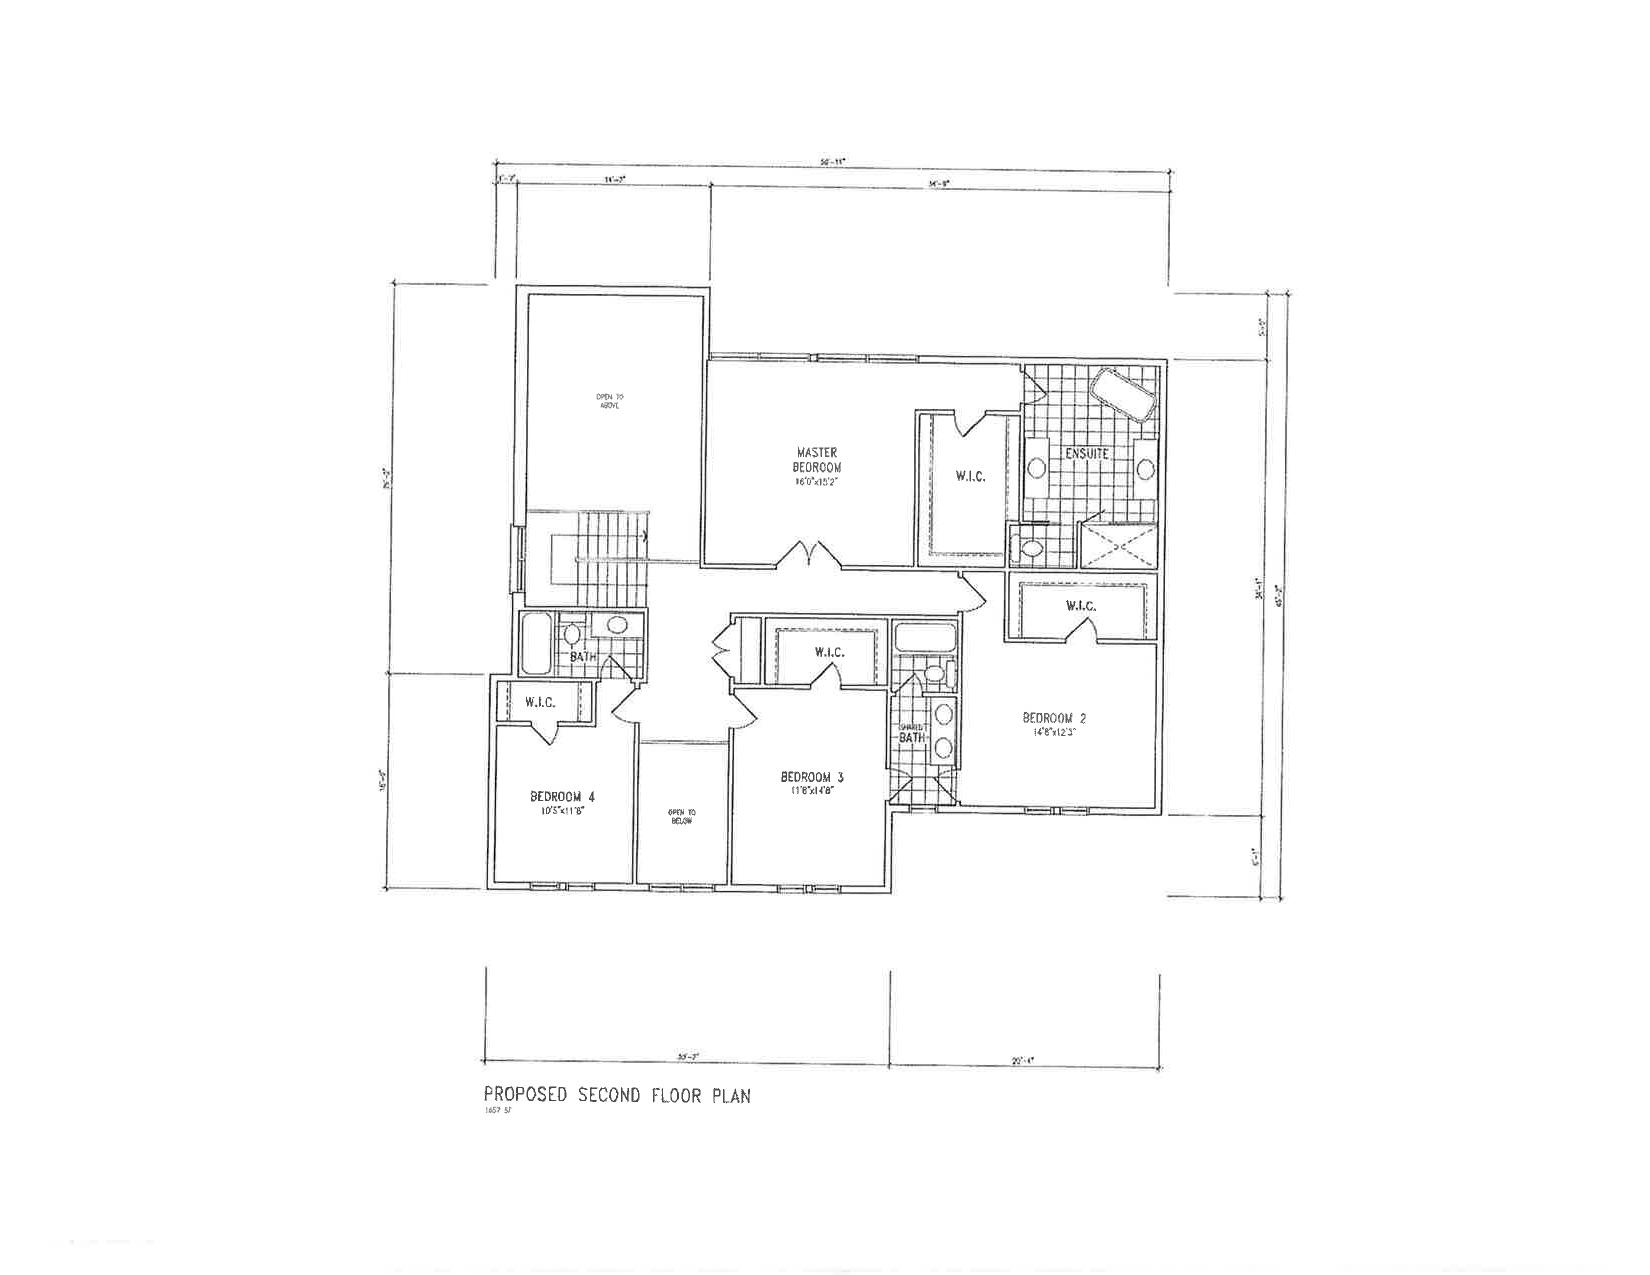 4 Proposed Second Floor Plan